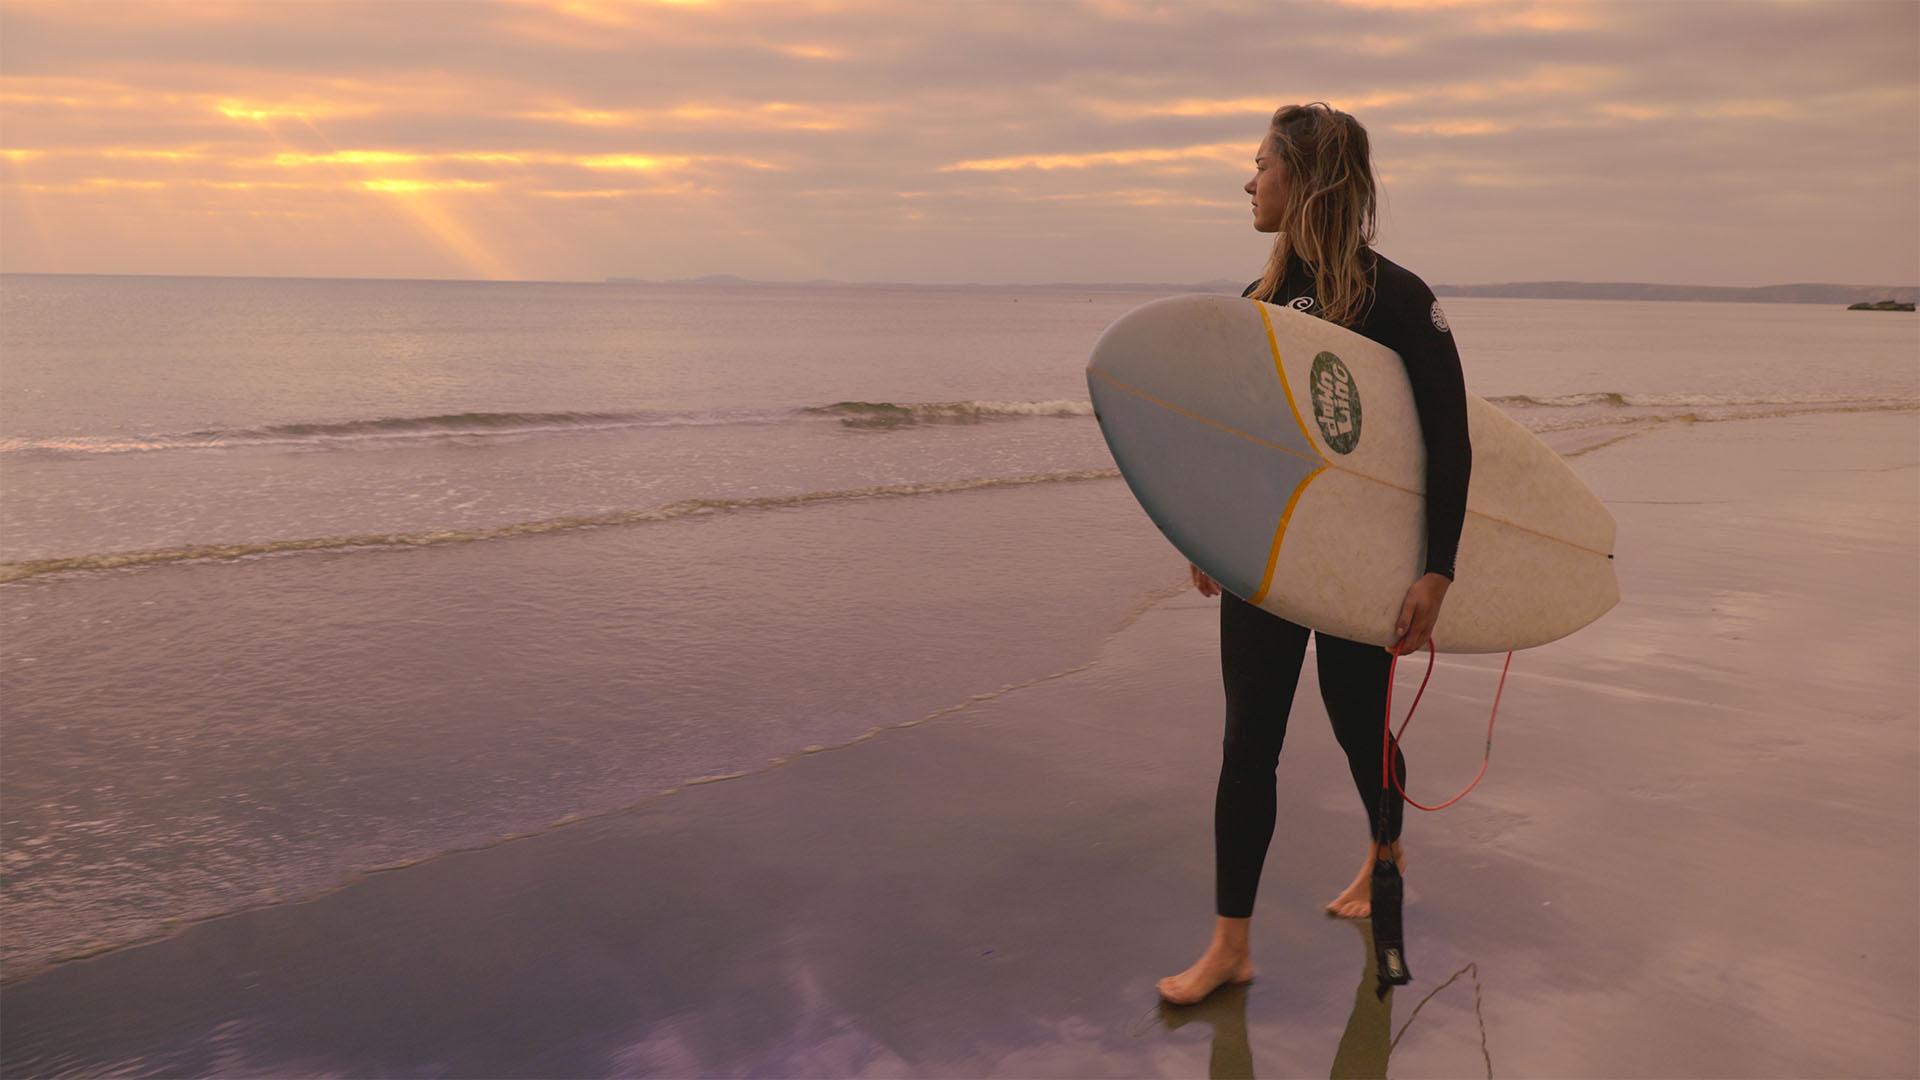 RedShark's Maari Innes looks for those waves!